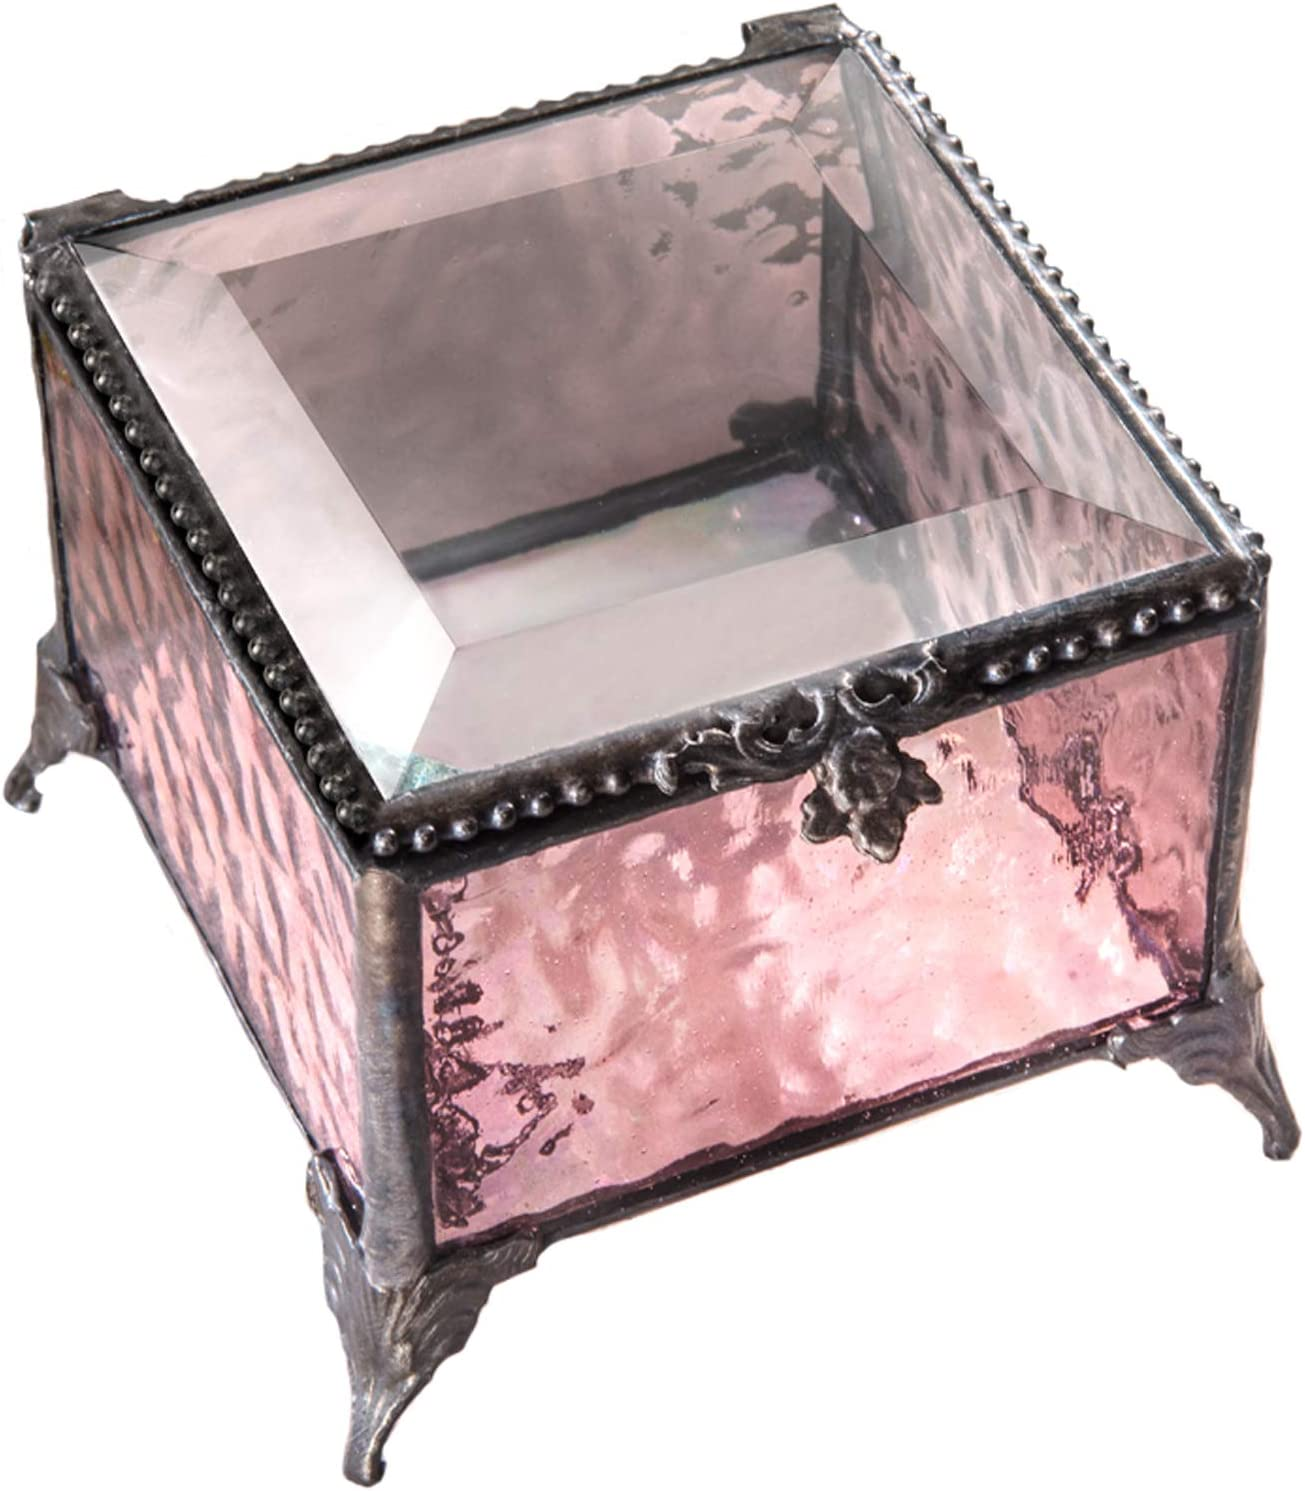 Pink Glass Jewelry Box Decorative Keepsake Storage Organizer Trinket Case Gift for Her J Devlin Box 903